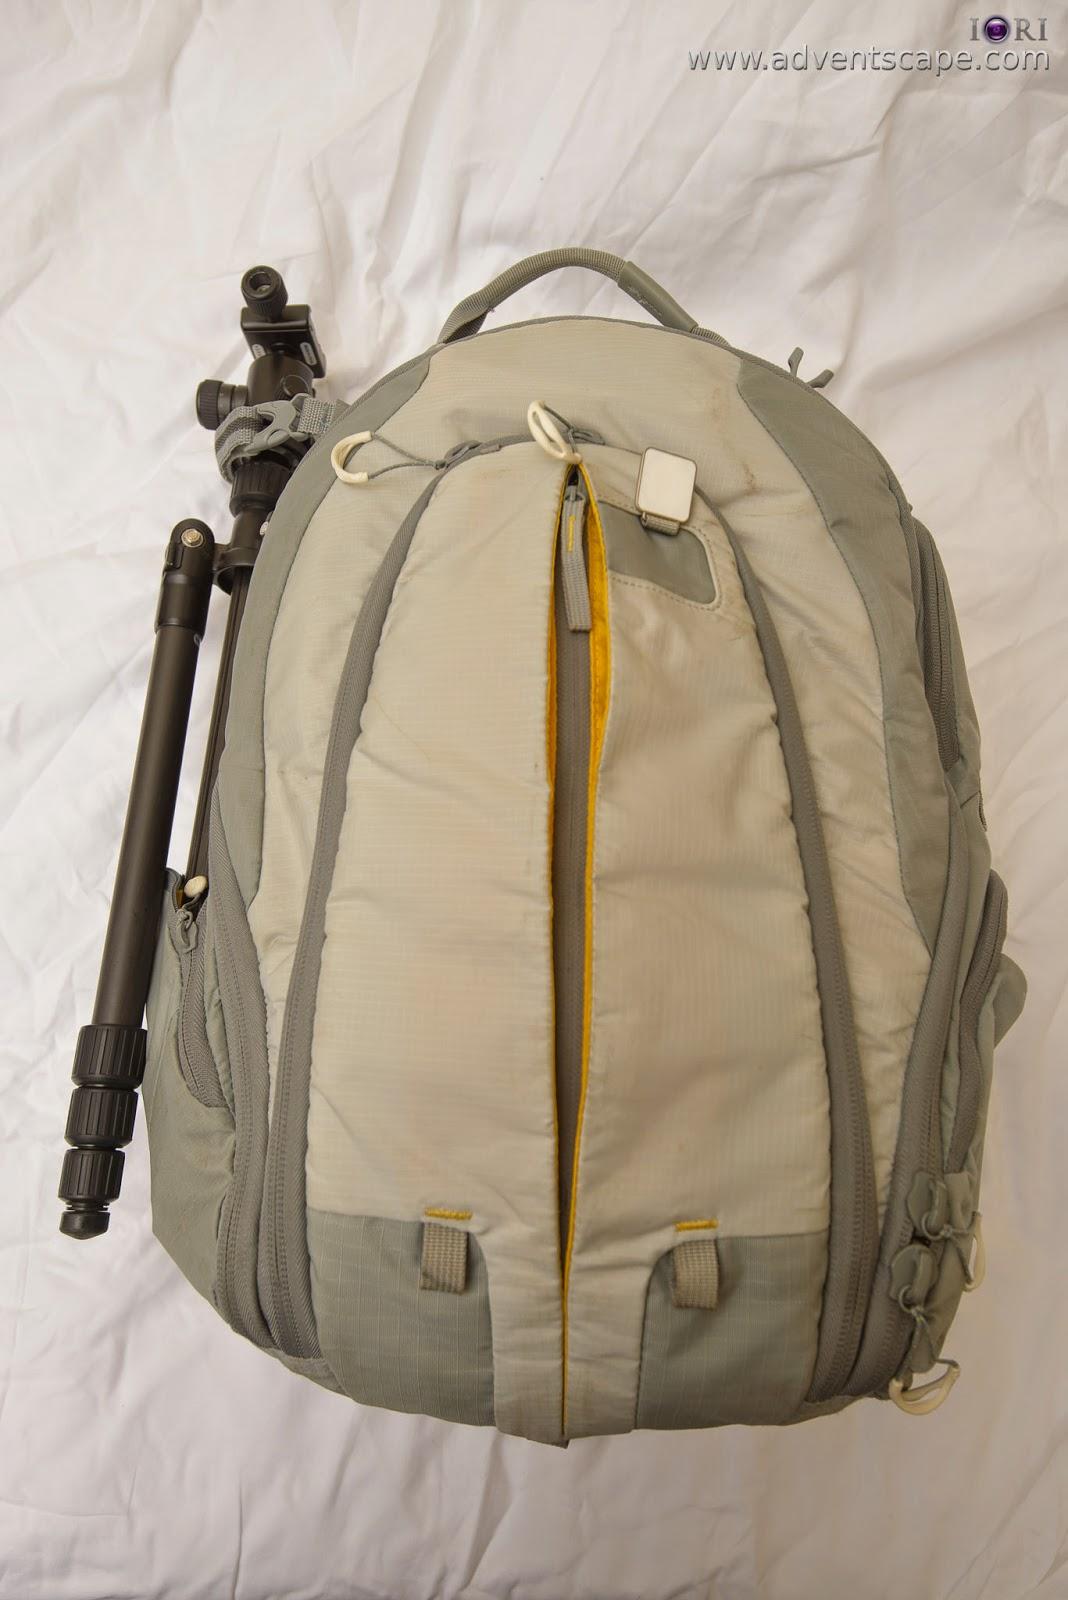 205, adventscape, Australian Landscape Photographer, bag, Bug, Kata, Manfrotto, Philip Avellana, review, tripod holder, side